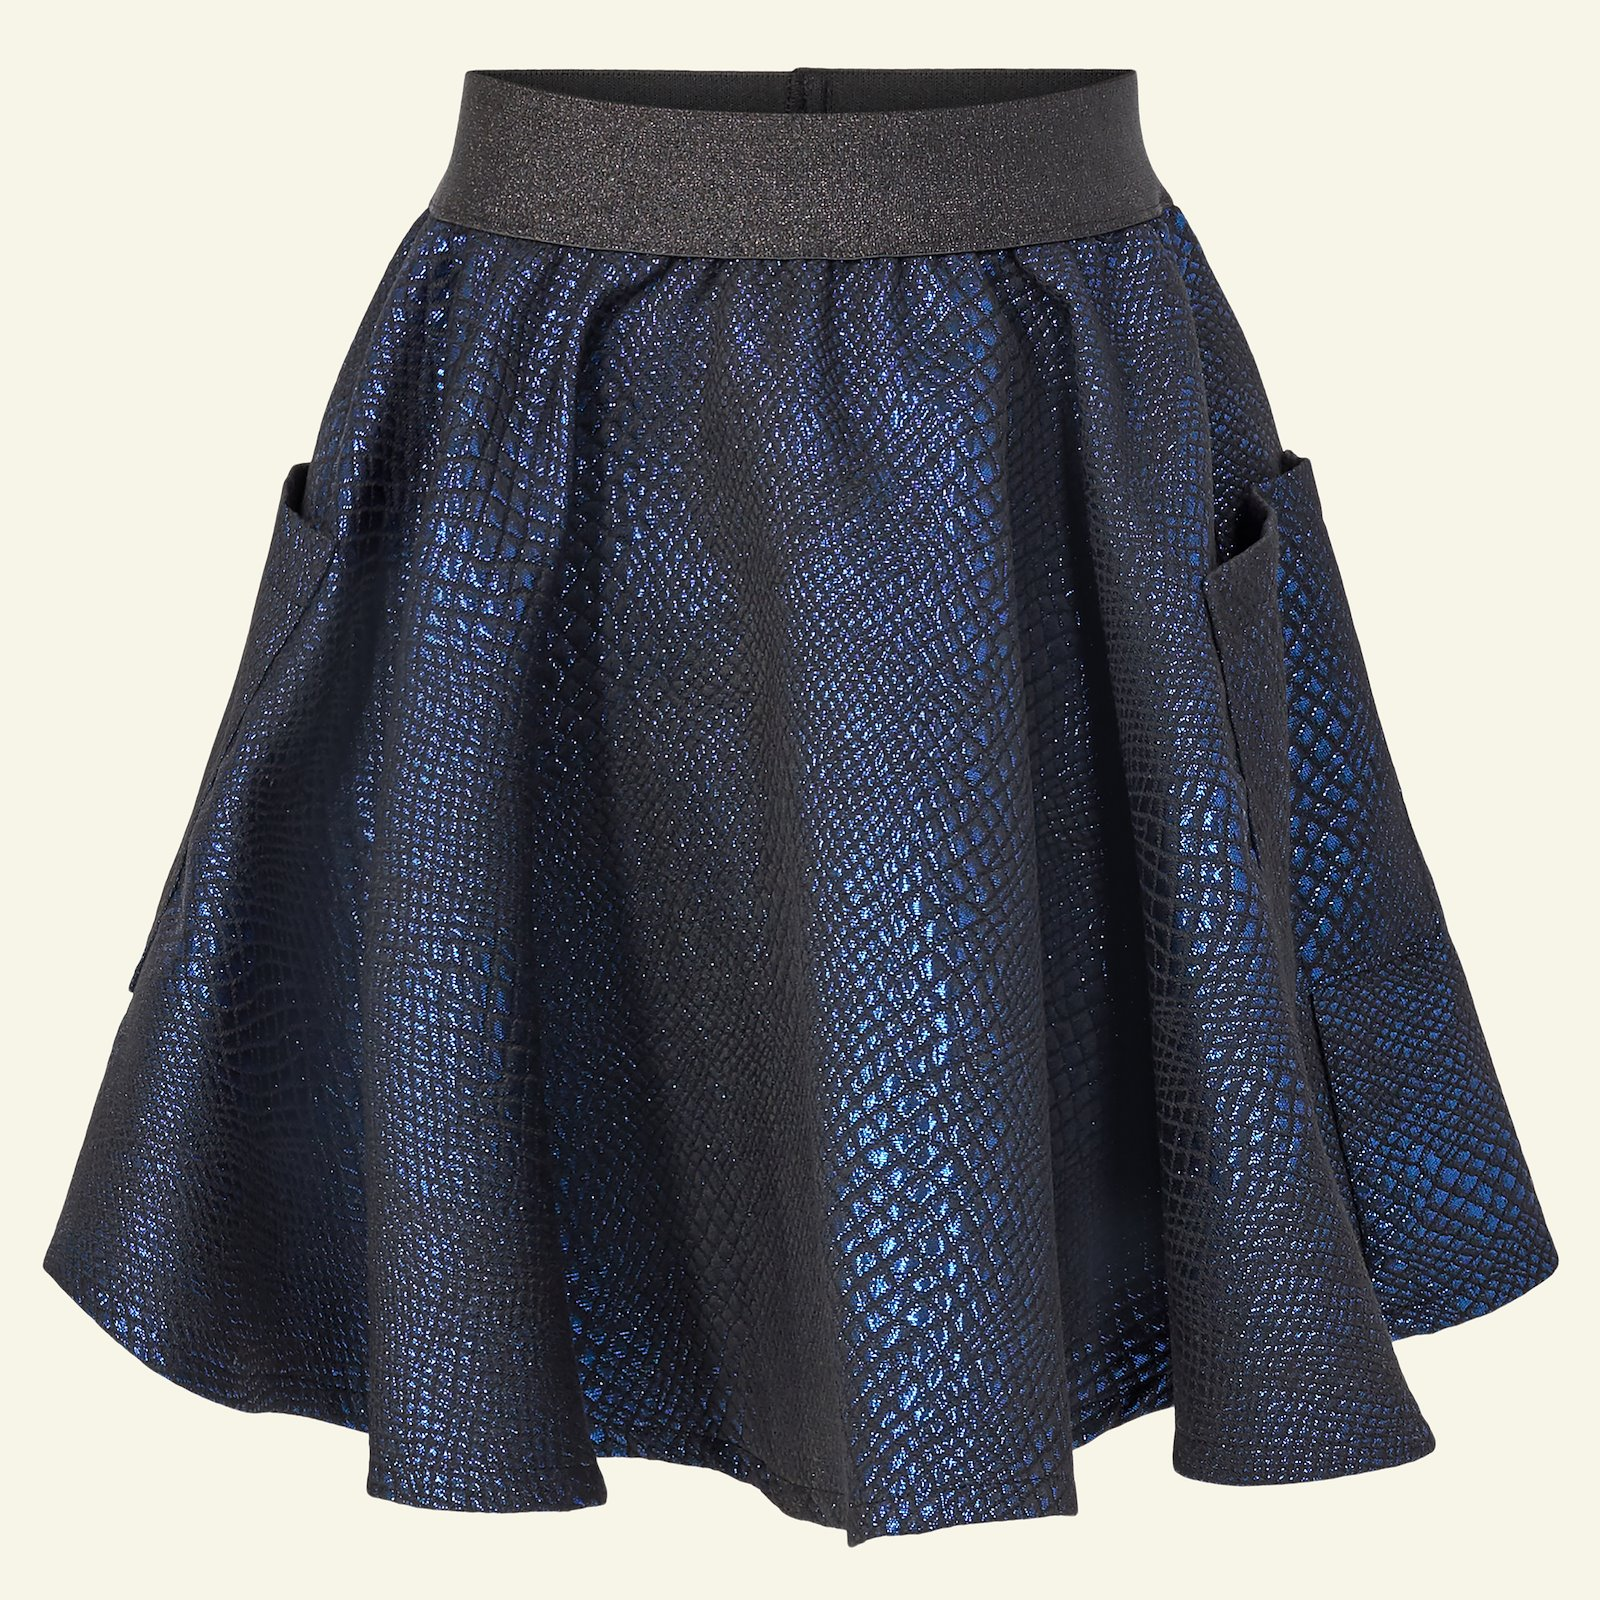 Woven jacquard with blue lurex p61018_400307_sskit